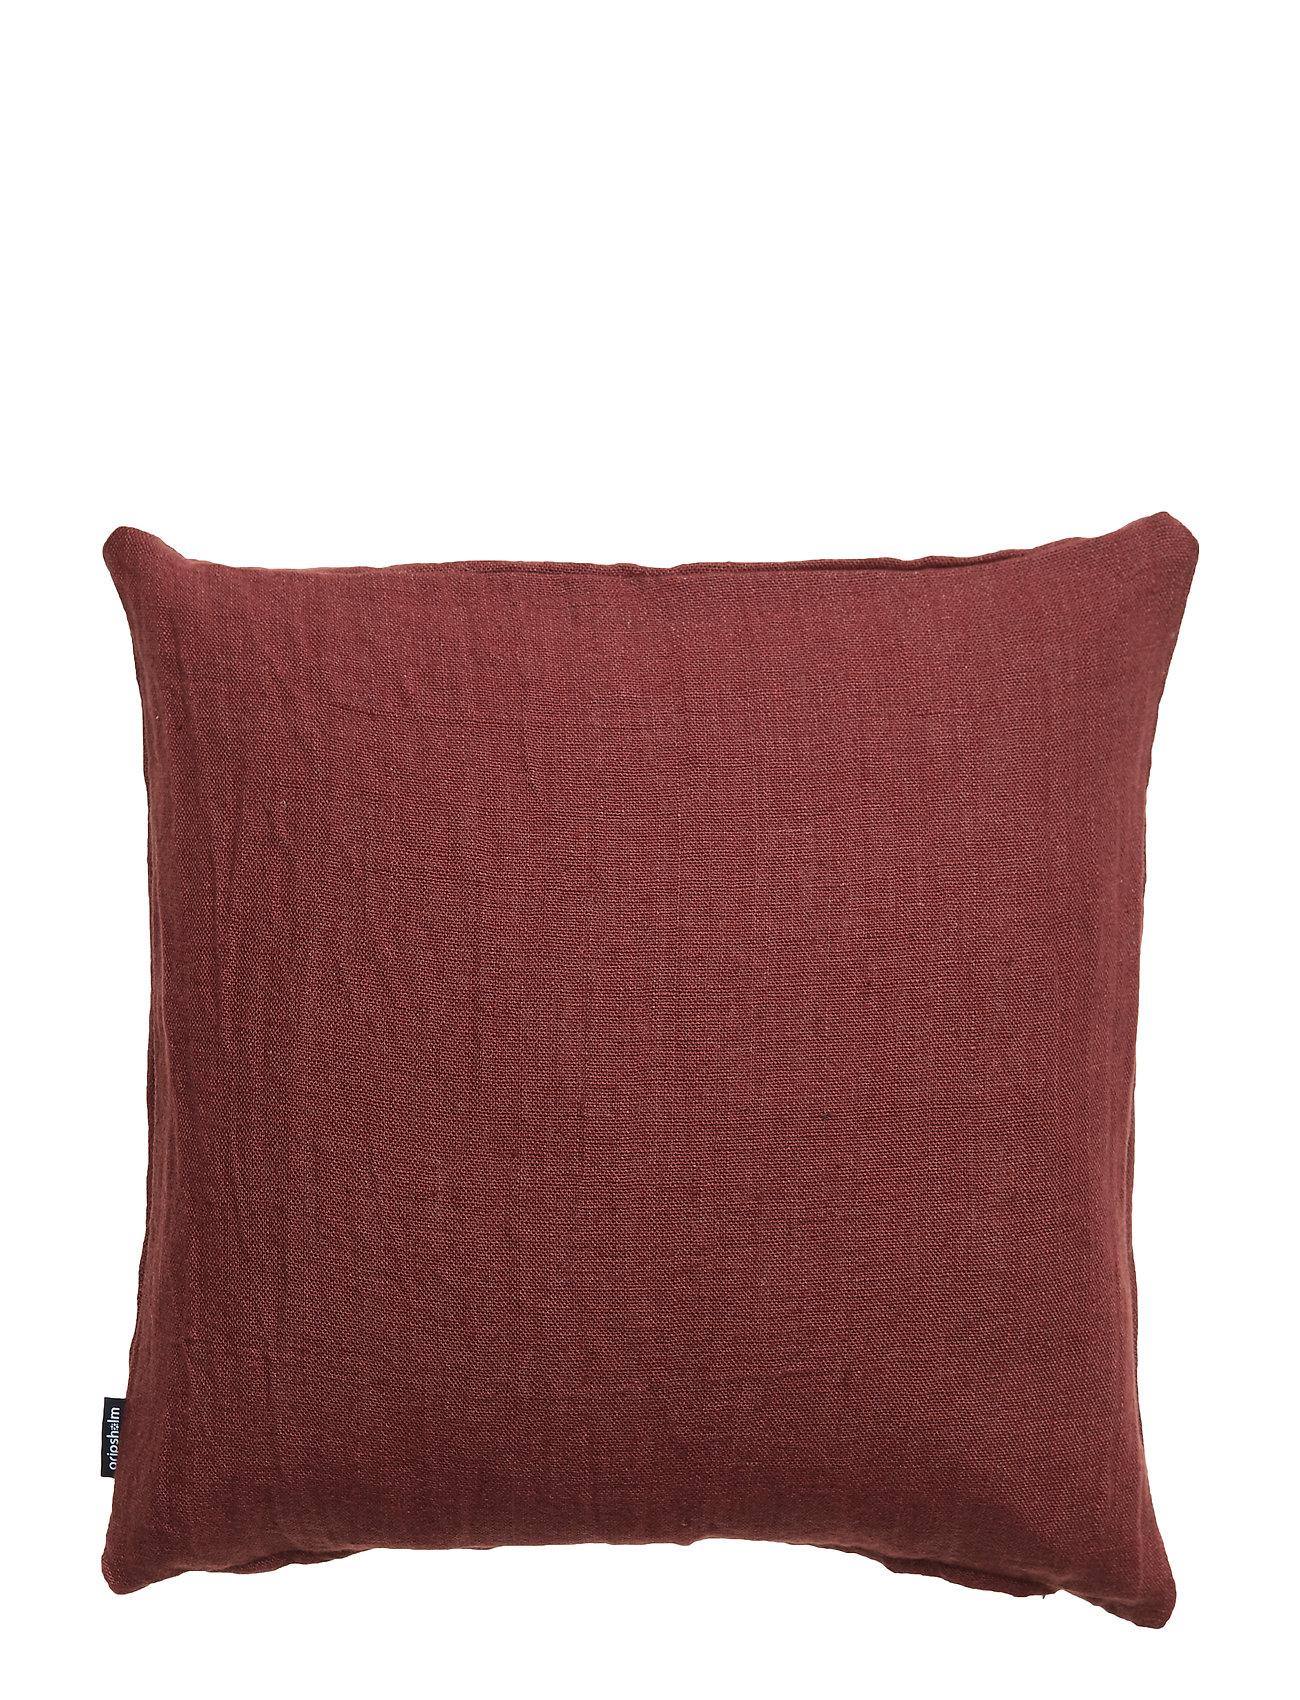 CoverwineGripsholm Cushion Cushion CoverwineGripsholm Cushion Cushion CoverwineGripsholm CoverwineGripsholm hCBQdtsrx